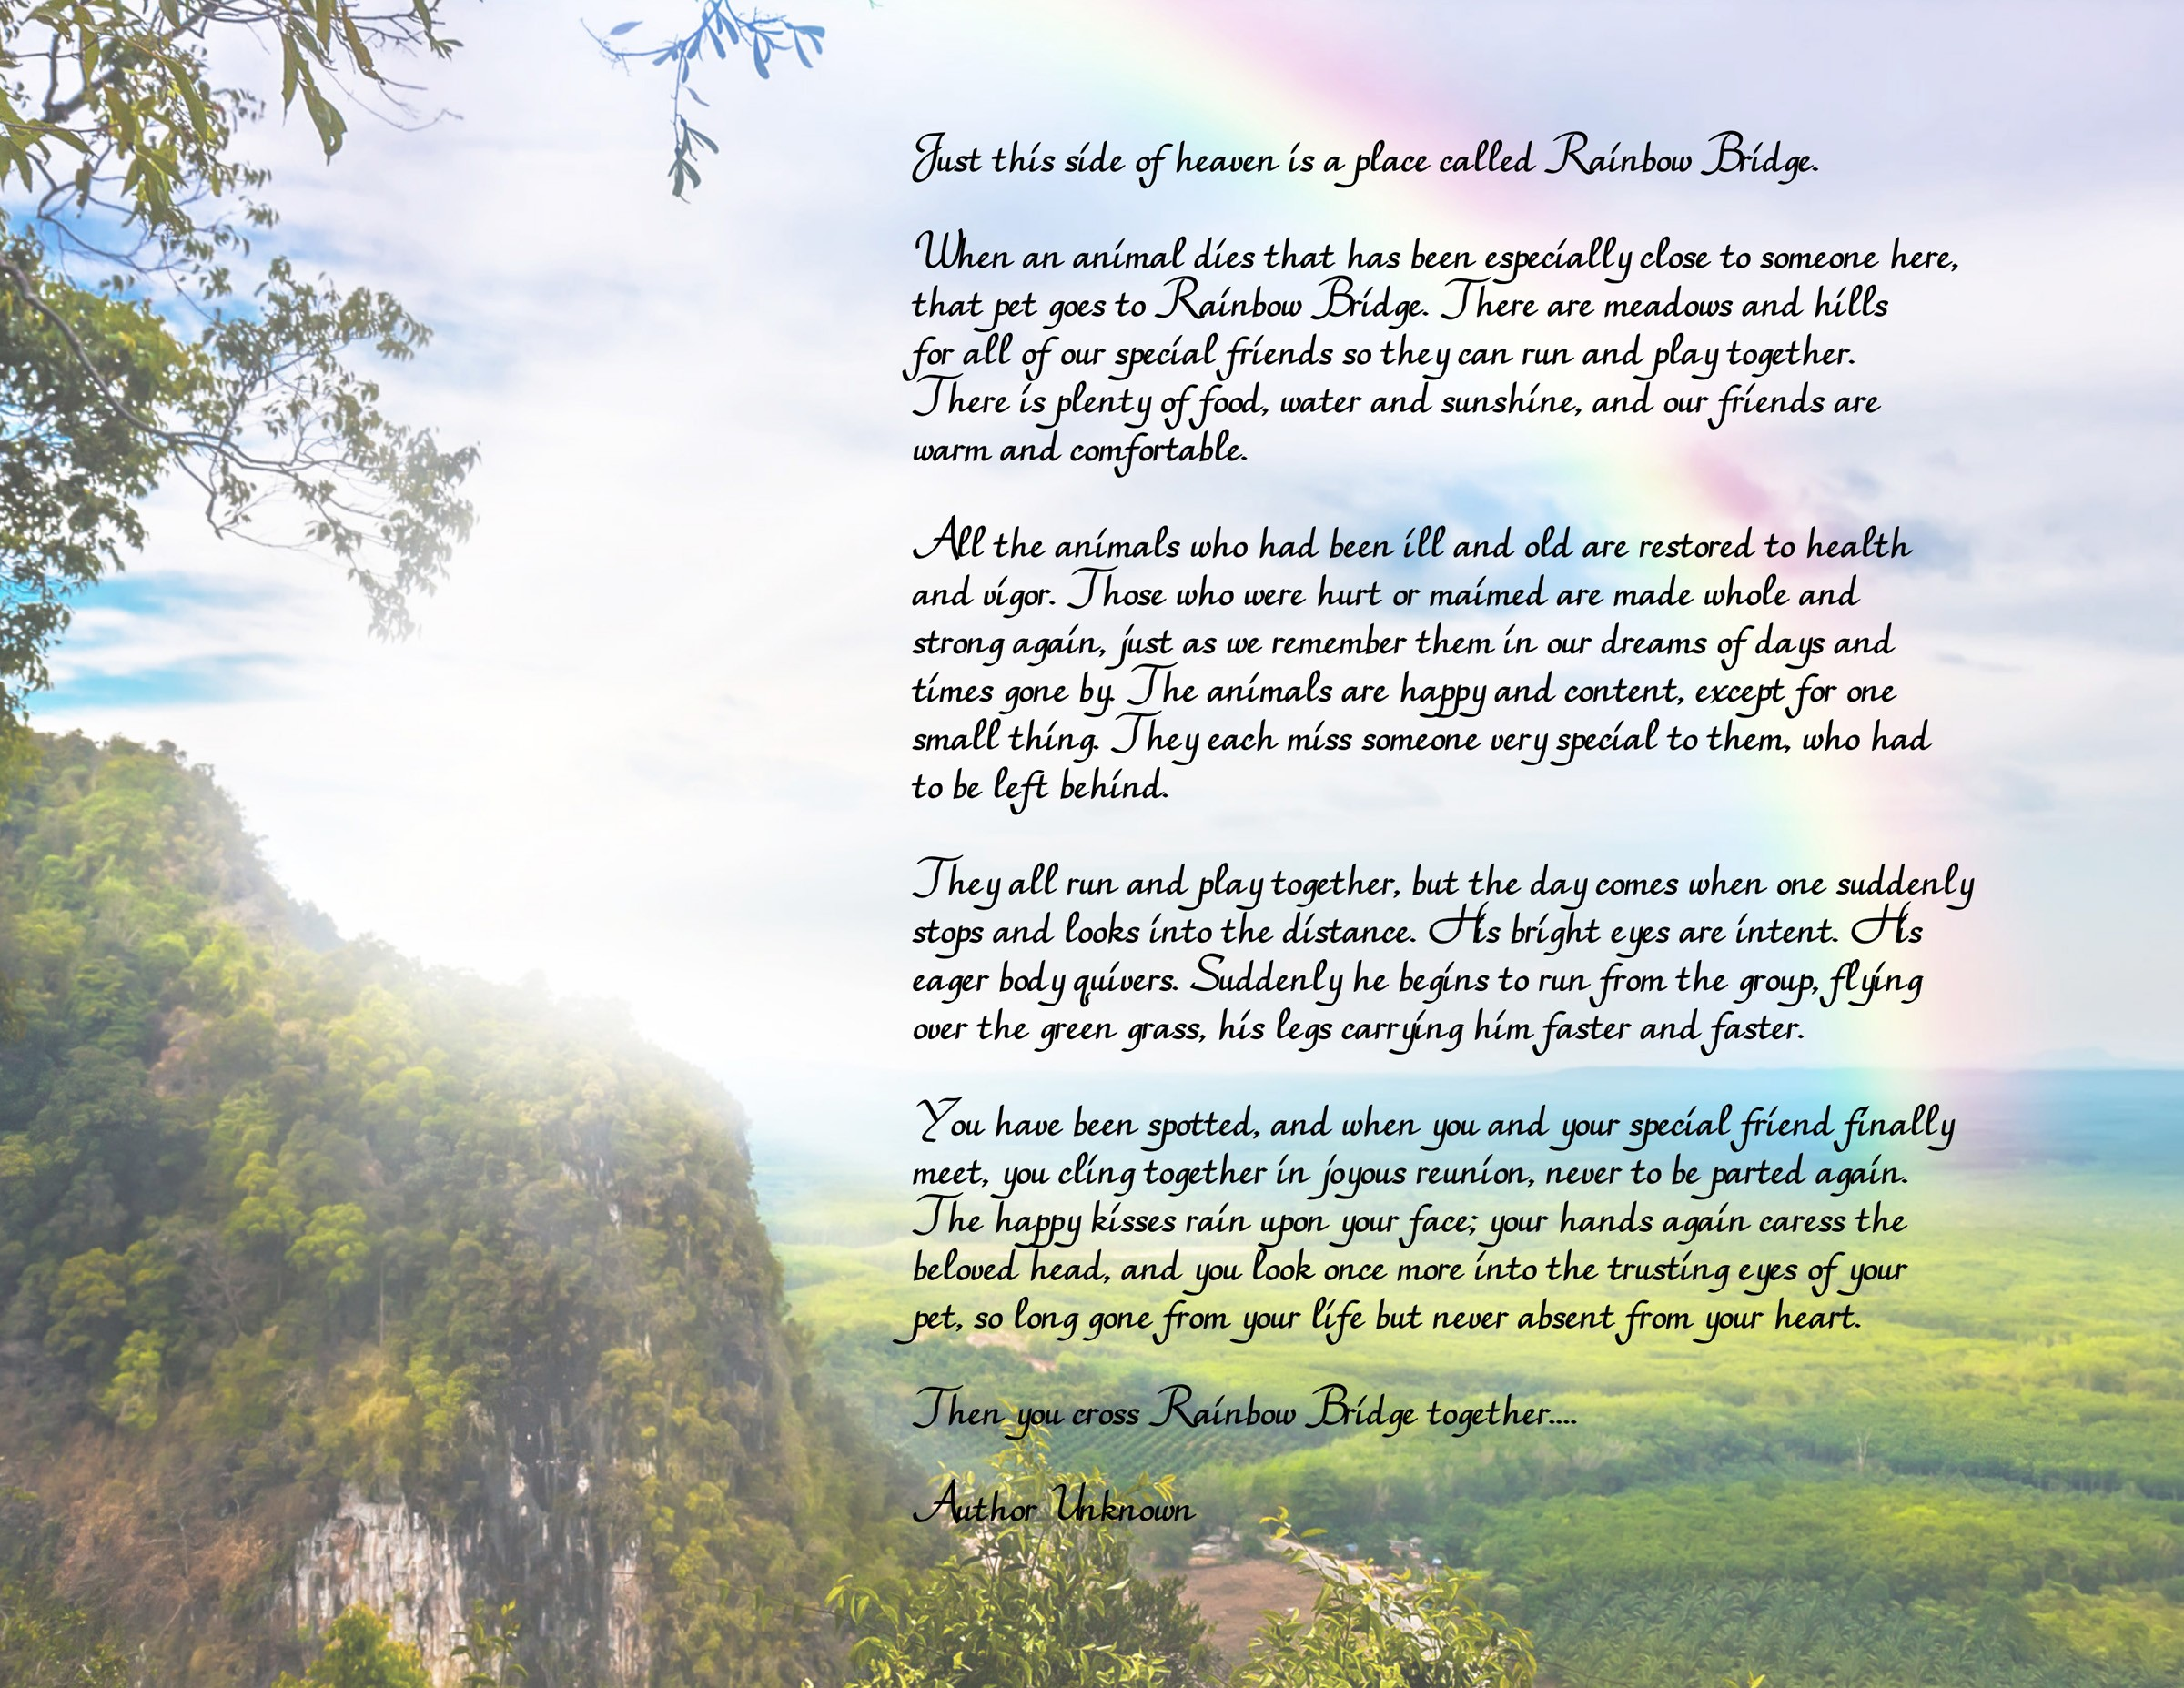 photo regarding Poem Rainbow Bridge Printable known as Classy Ladies 1a981bcf 9863 4cc2 Bb9e 3c947f2b5d1b 1024x1024